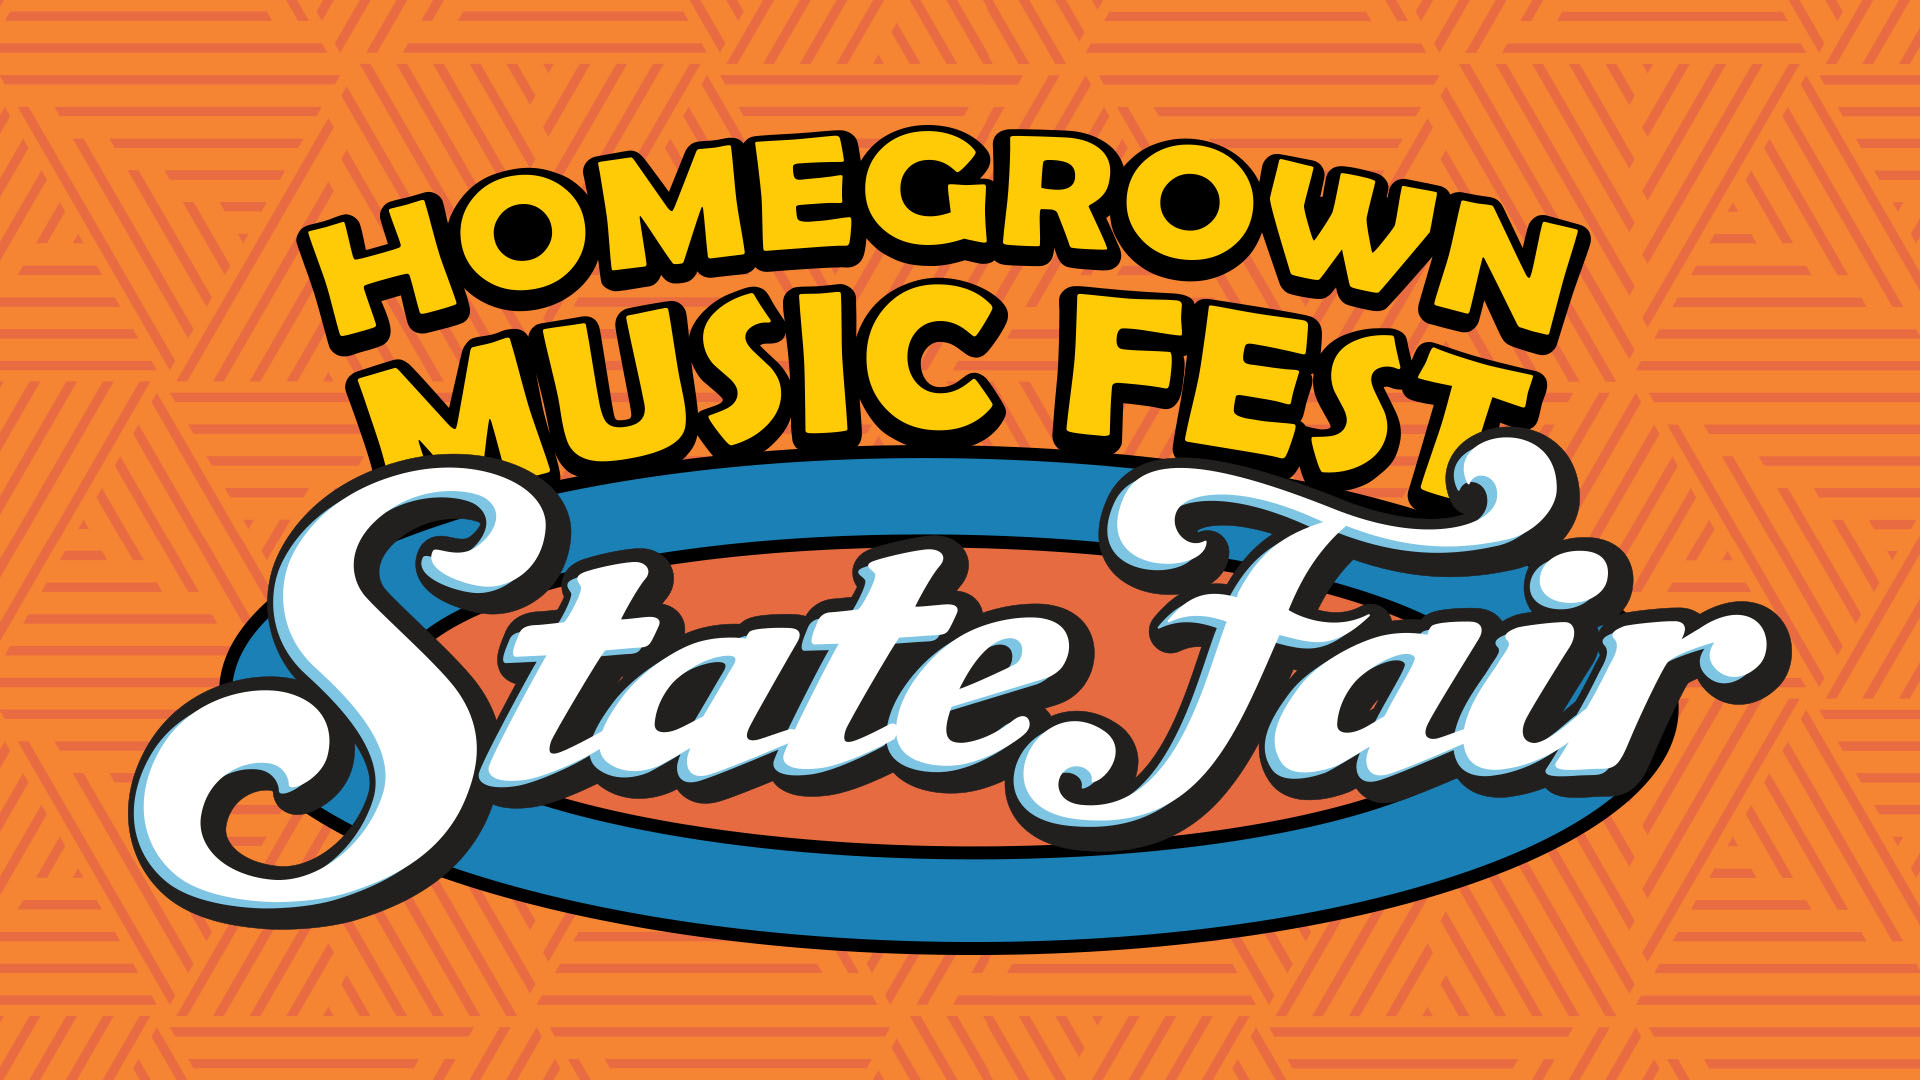 Homegrown Music Fest State Fair